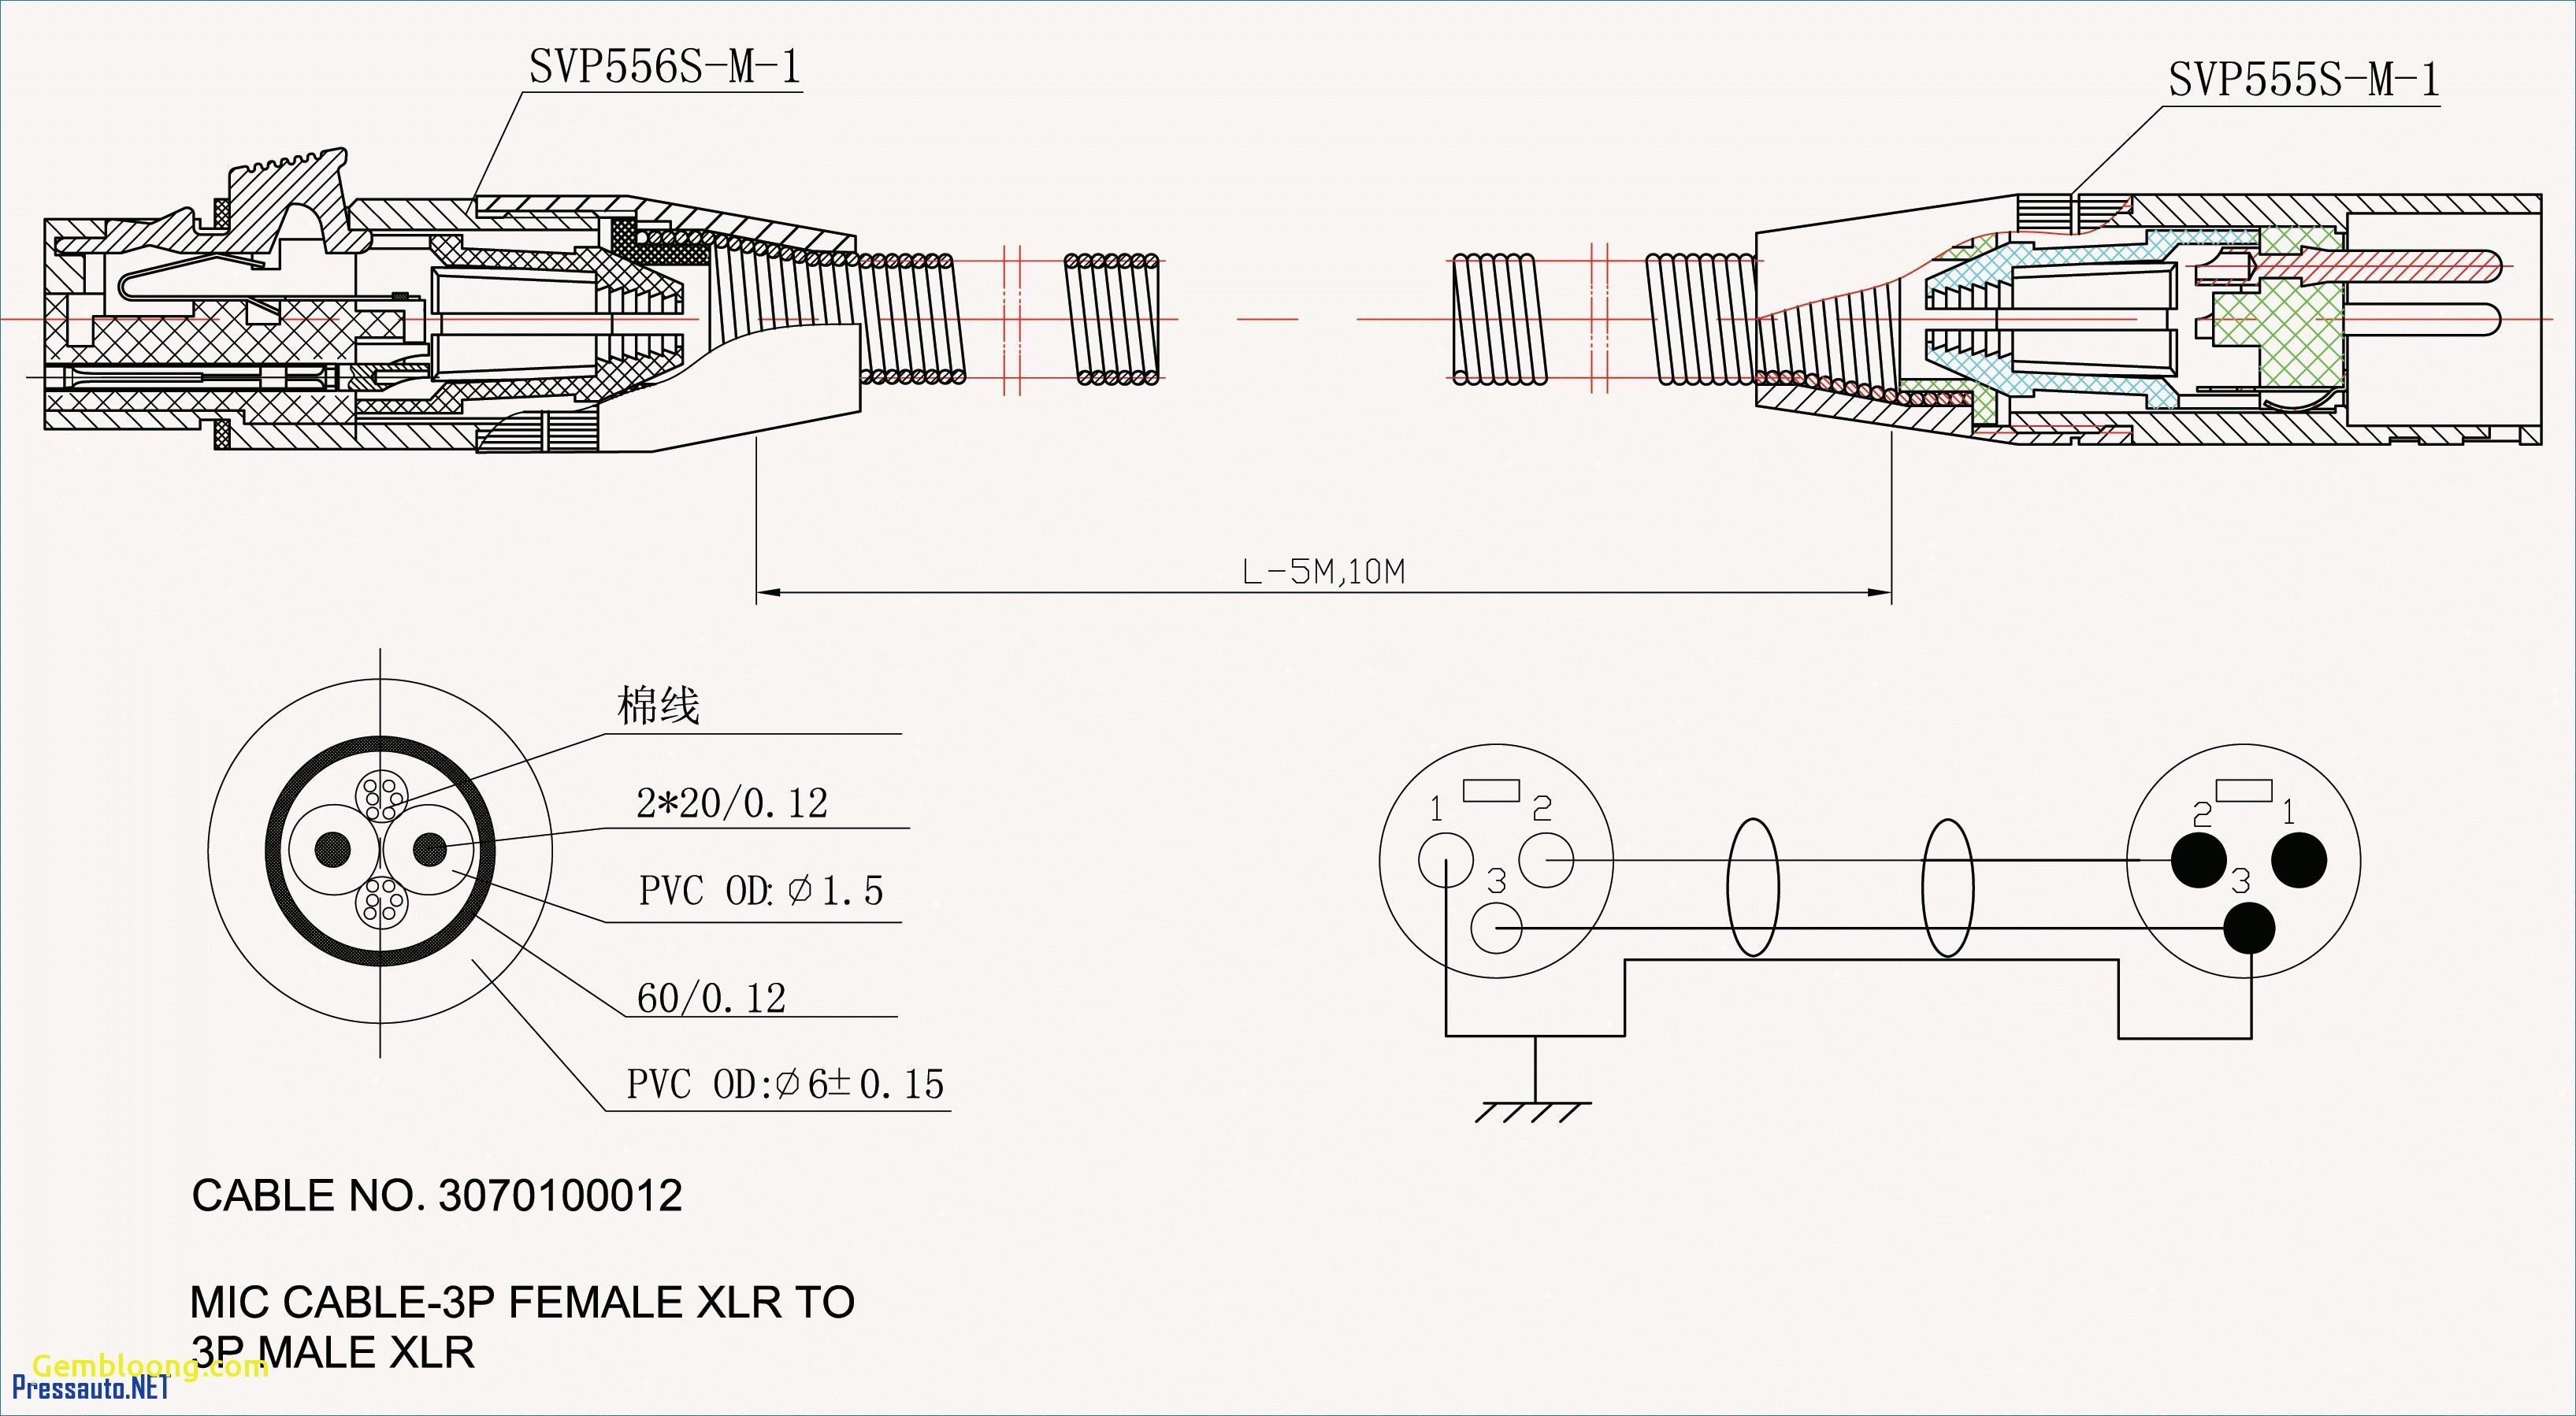 2001 ford Windstar Engine Diagram 94 Windstar Wiring Diagram Of 2001 ford Windstar Engine Diagram